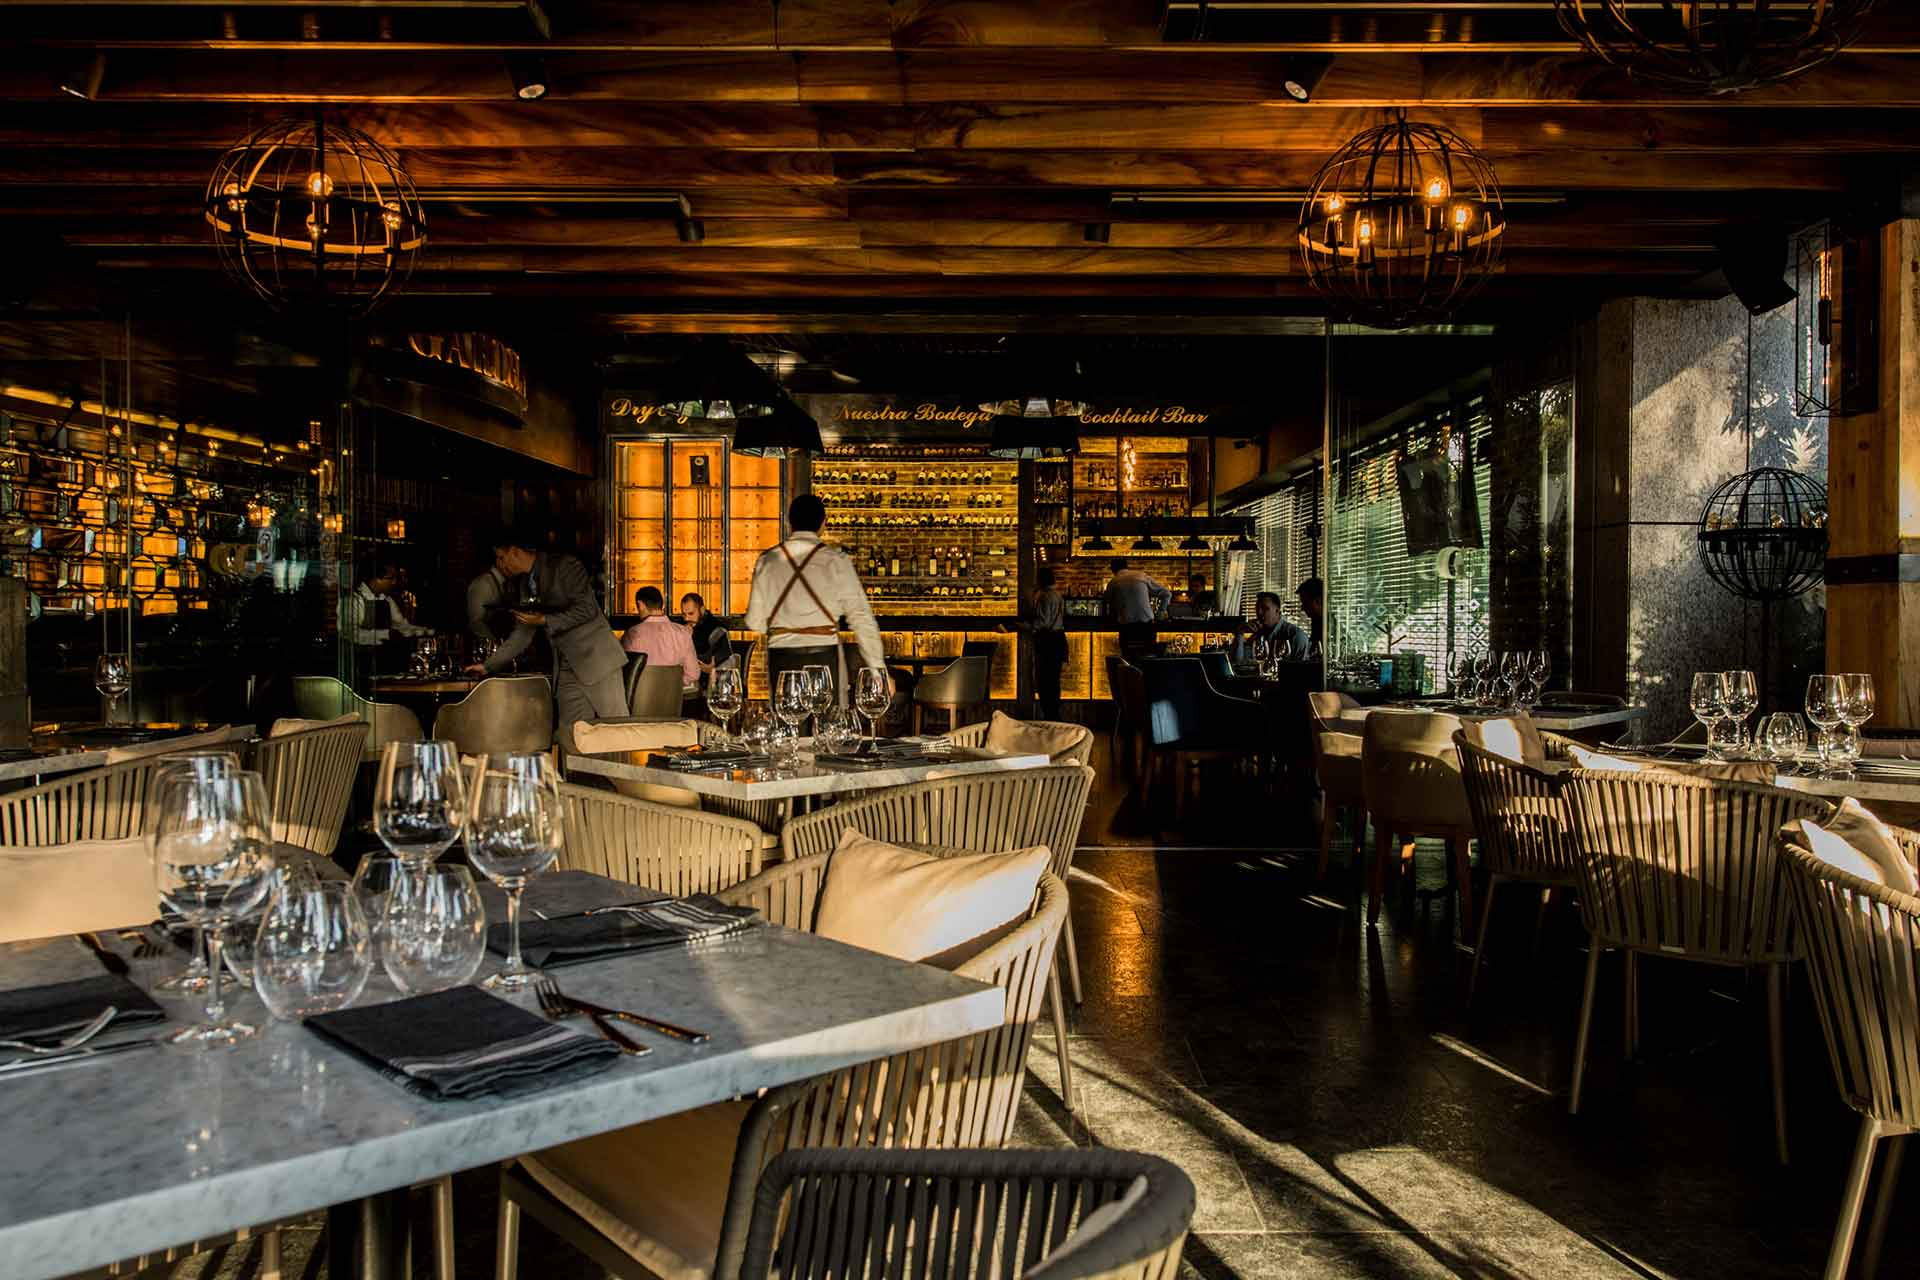 restaurante Gardela